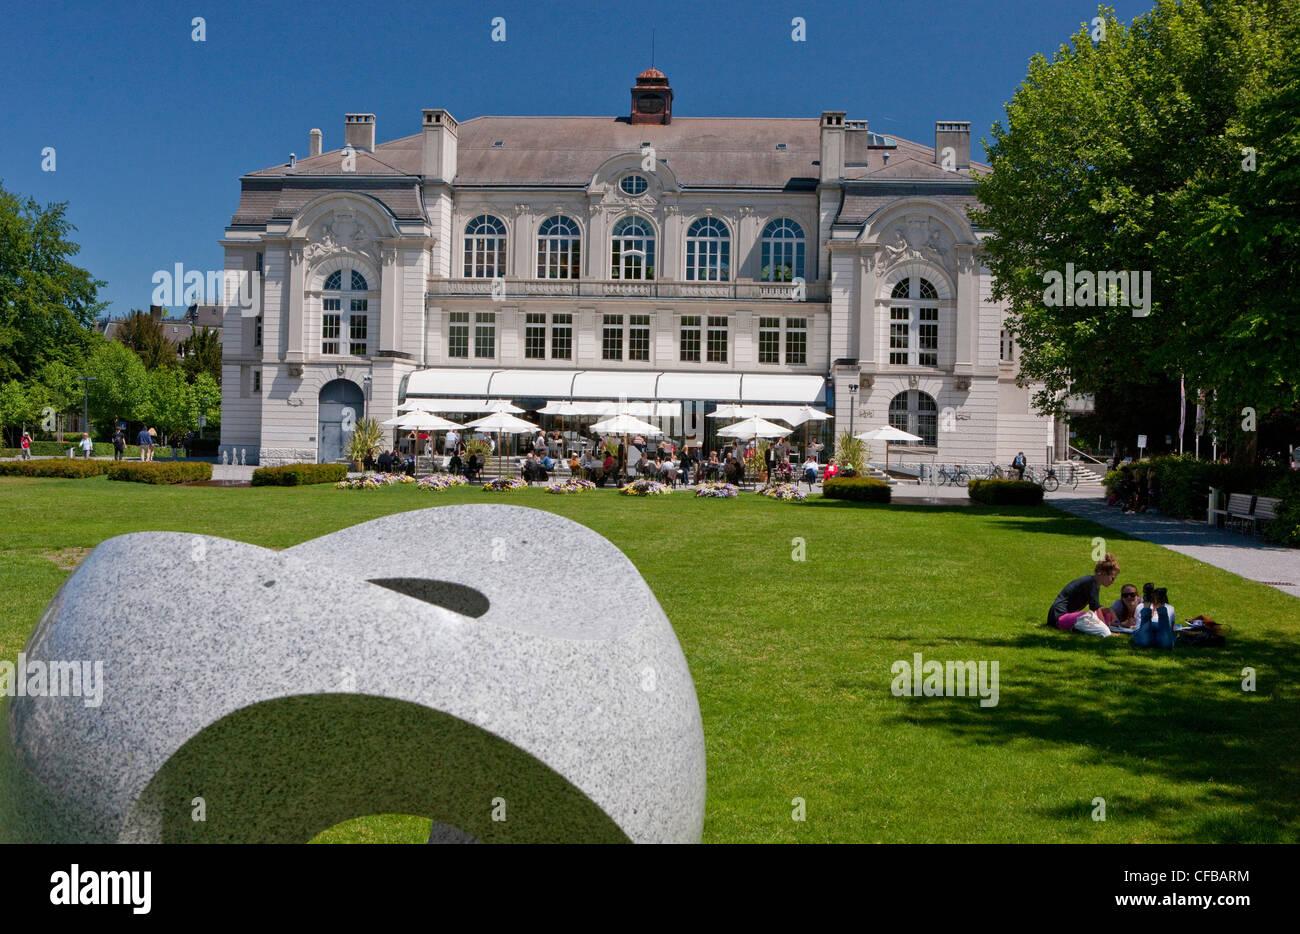 Canton St Gallen St Gall Switzerland Europe town city Stock